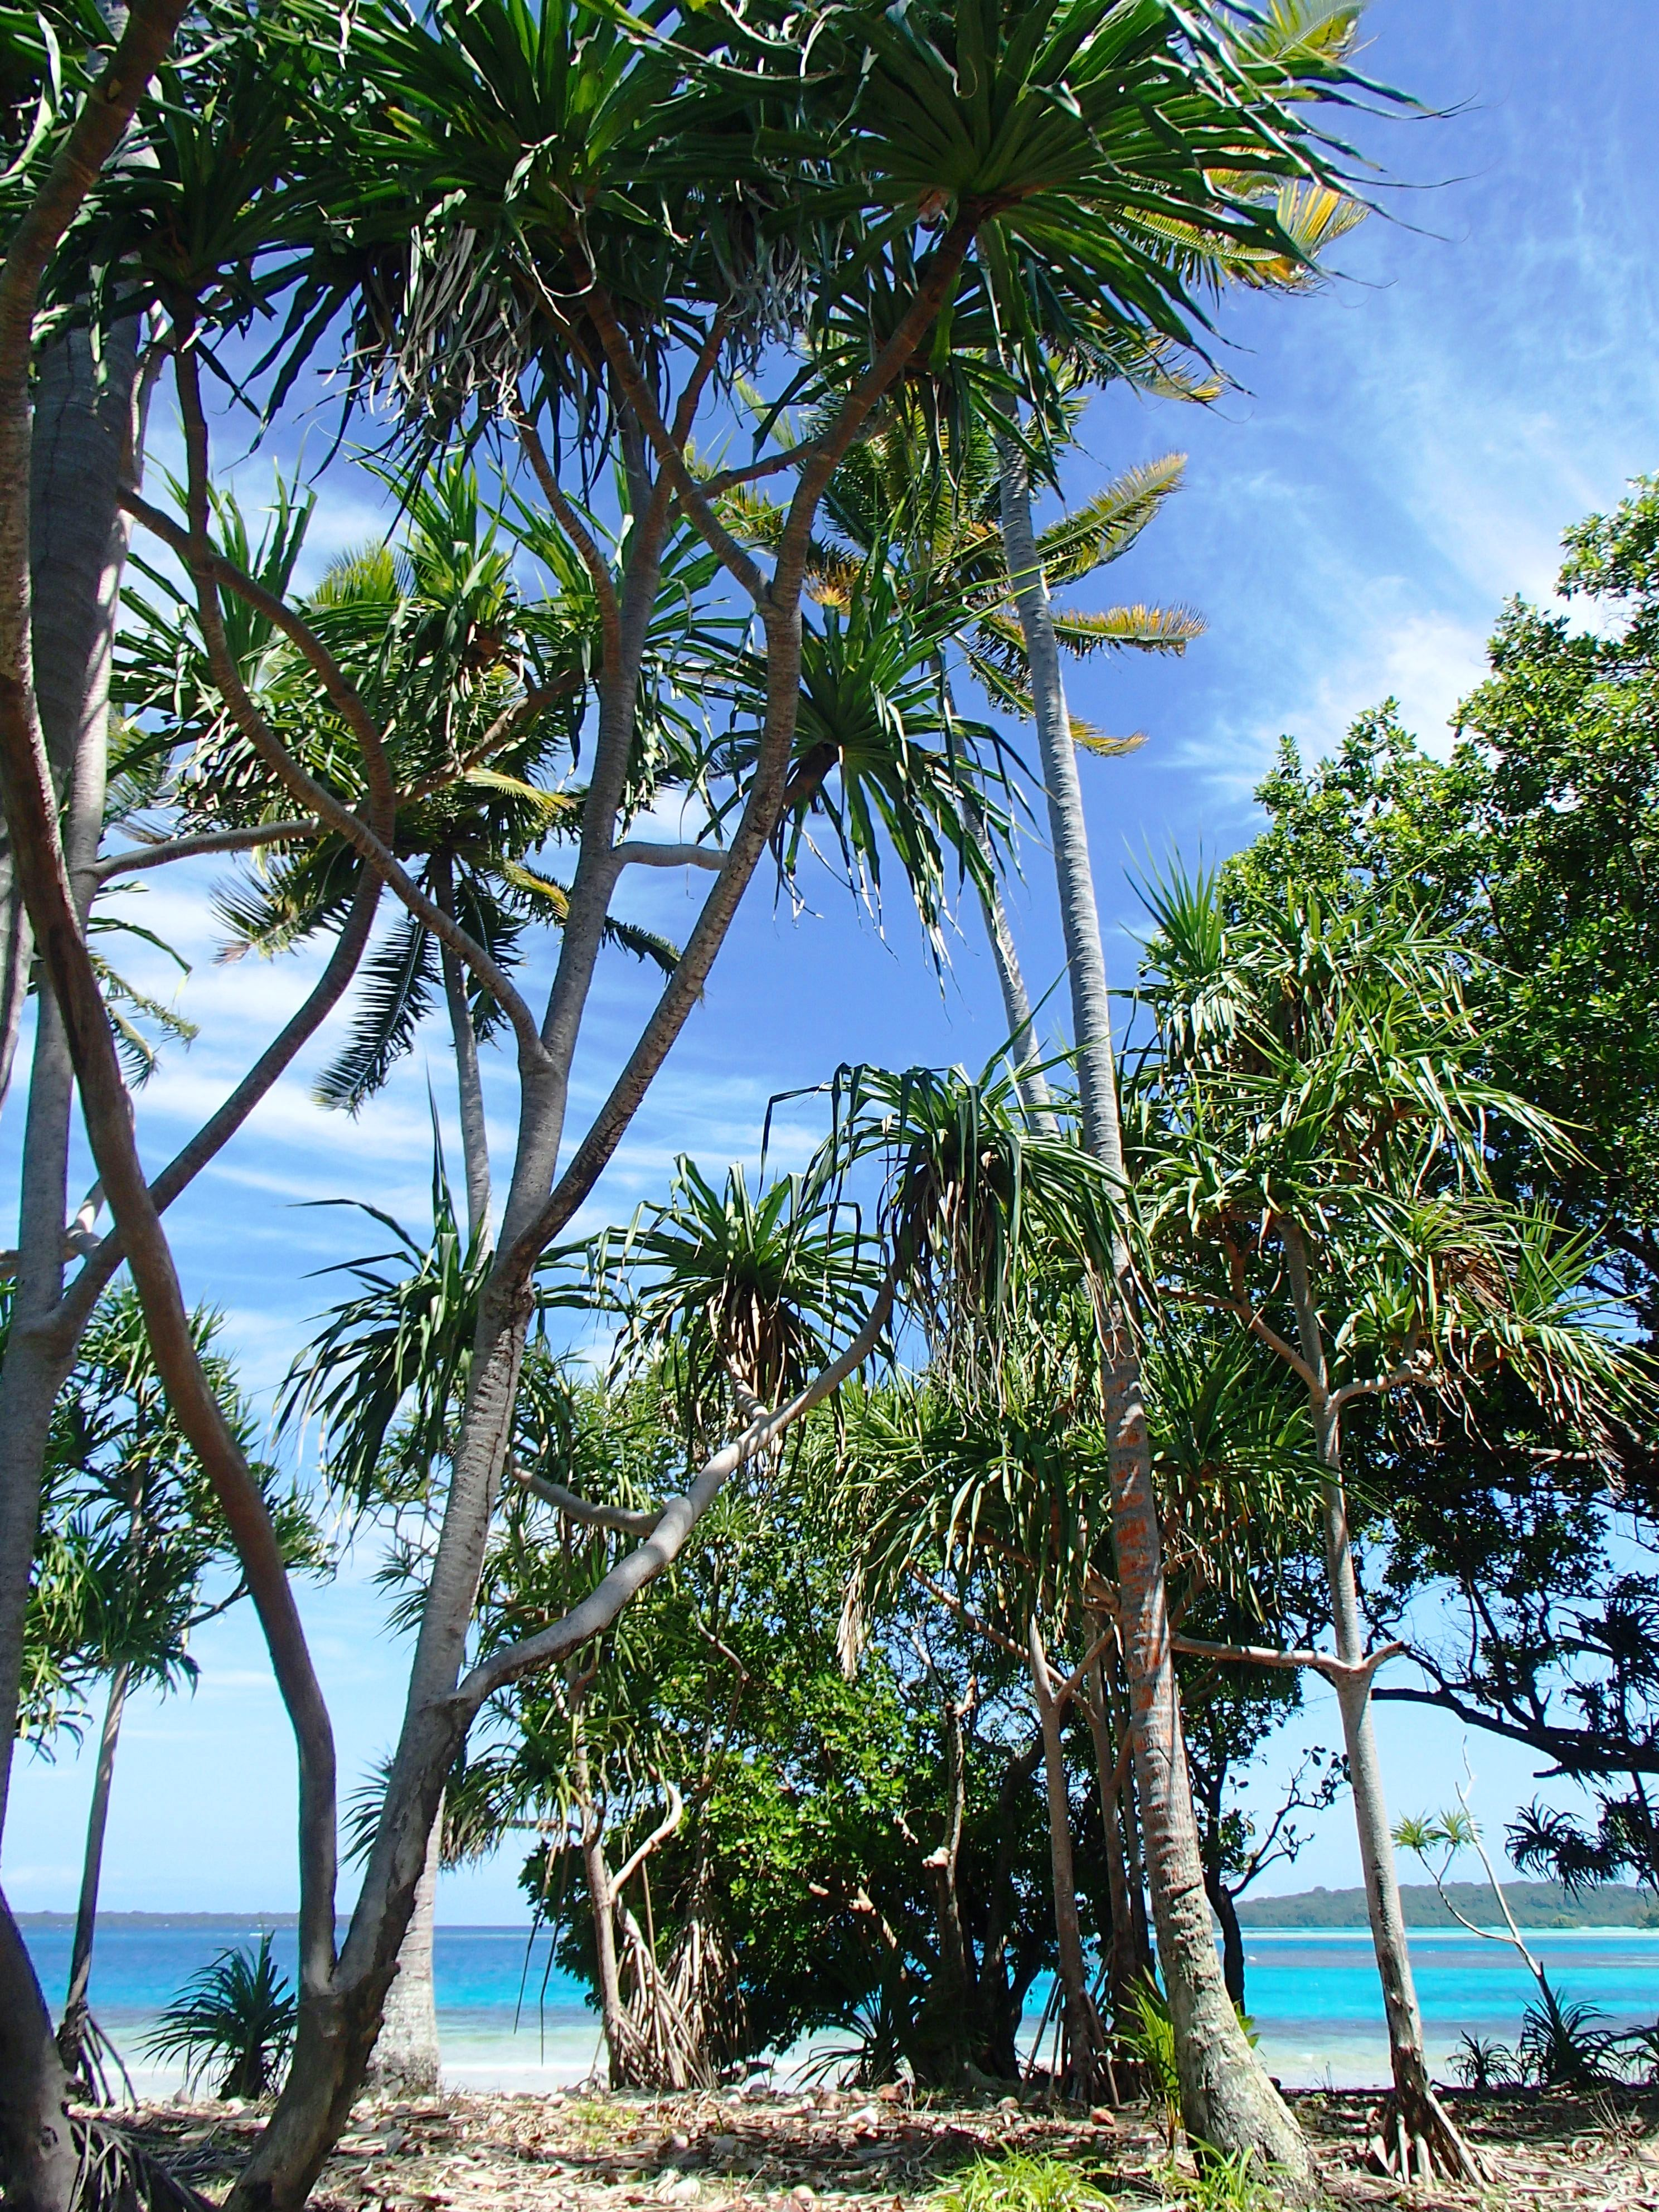 M Island Pics 2014 (6).jpg